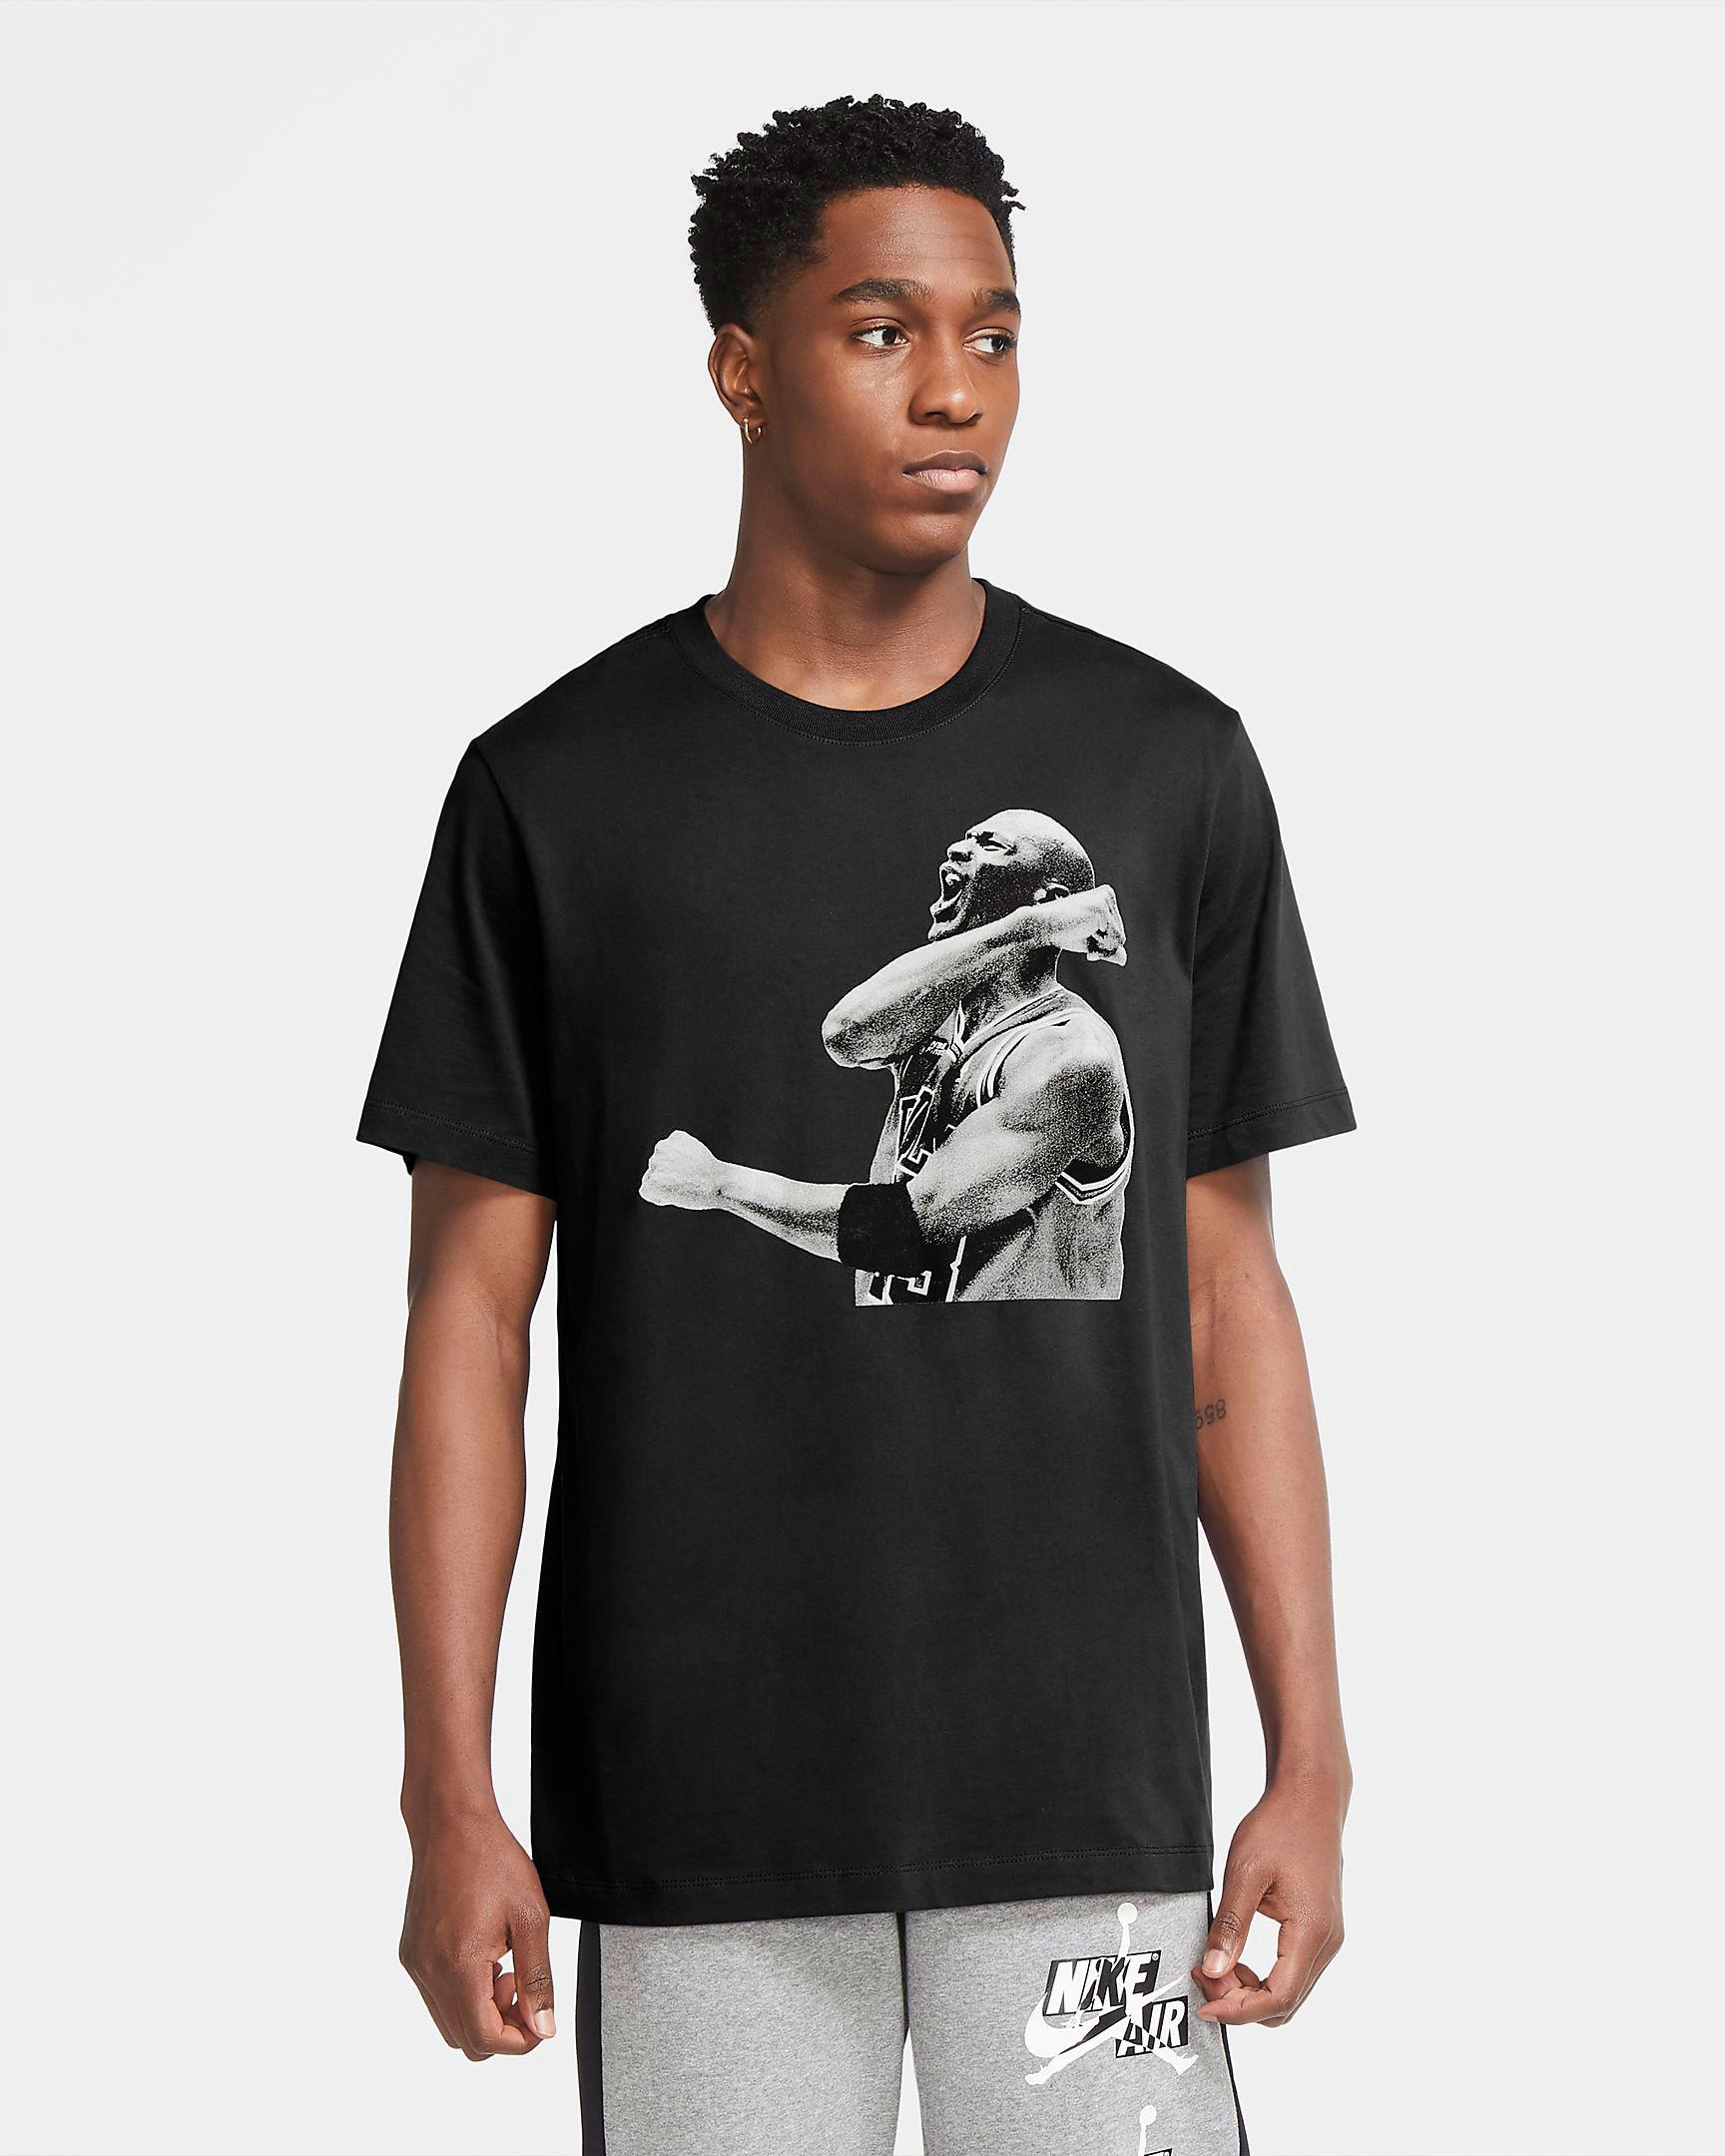 air-jordan-11-jubilee-photo-shirt